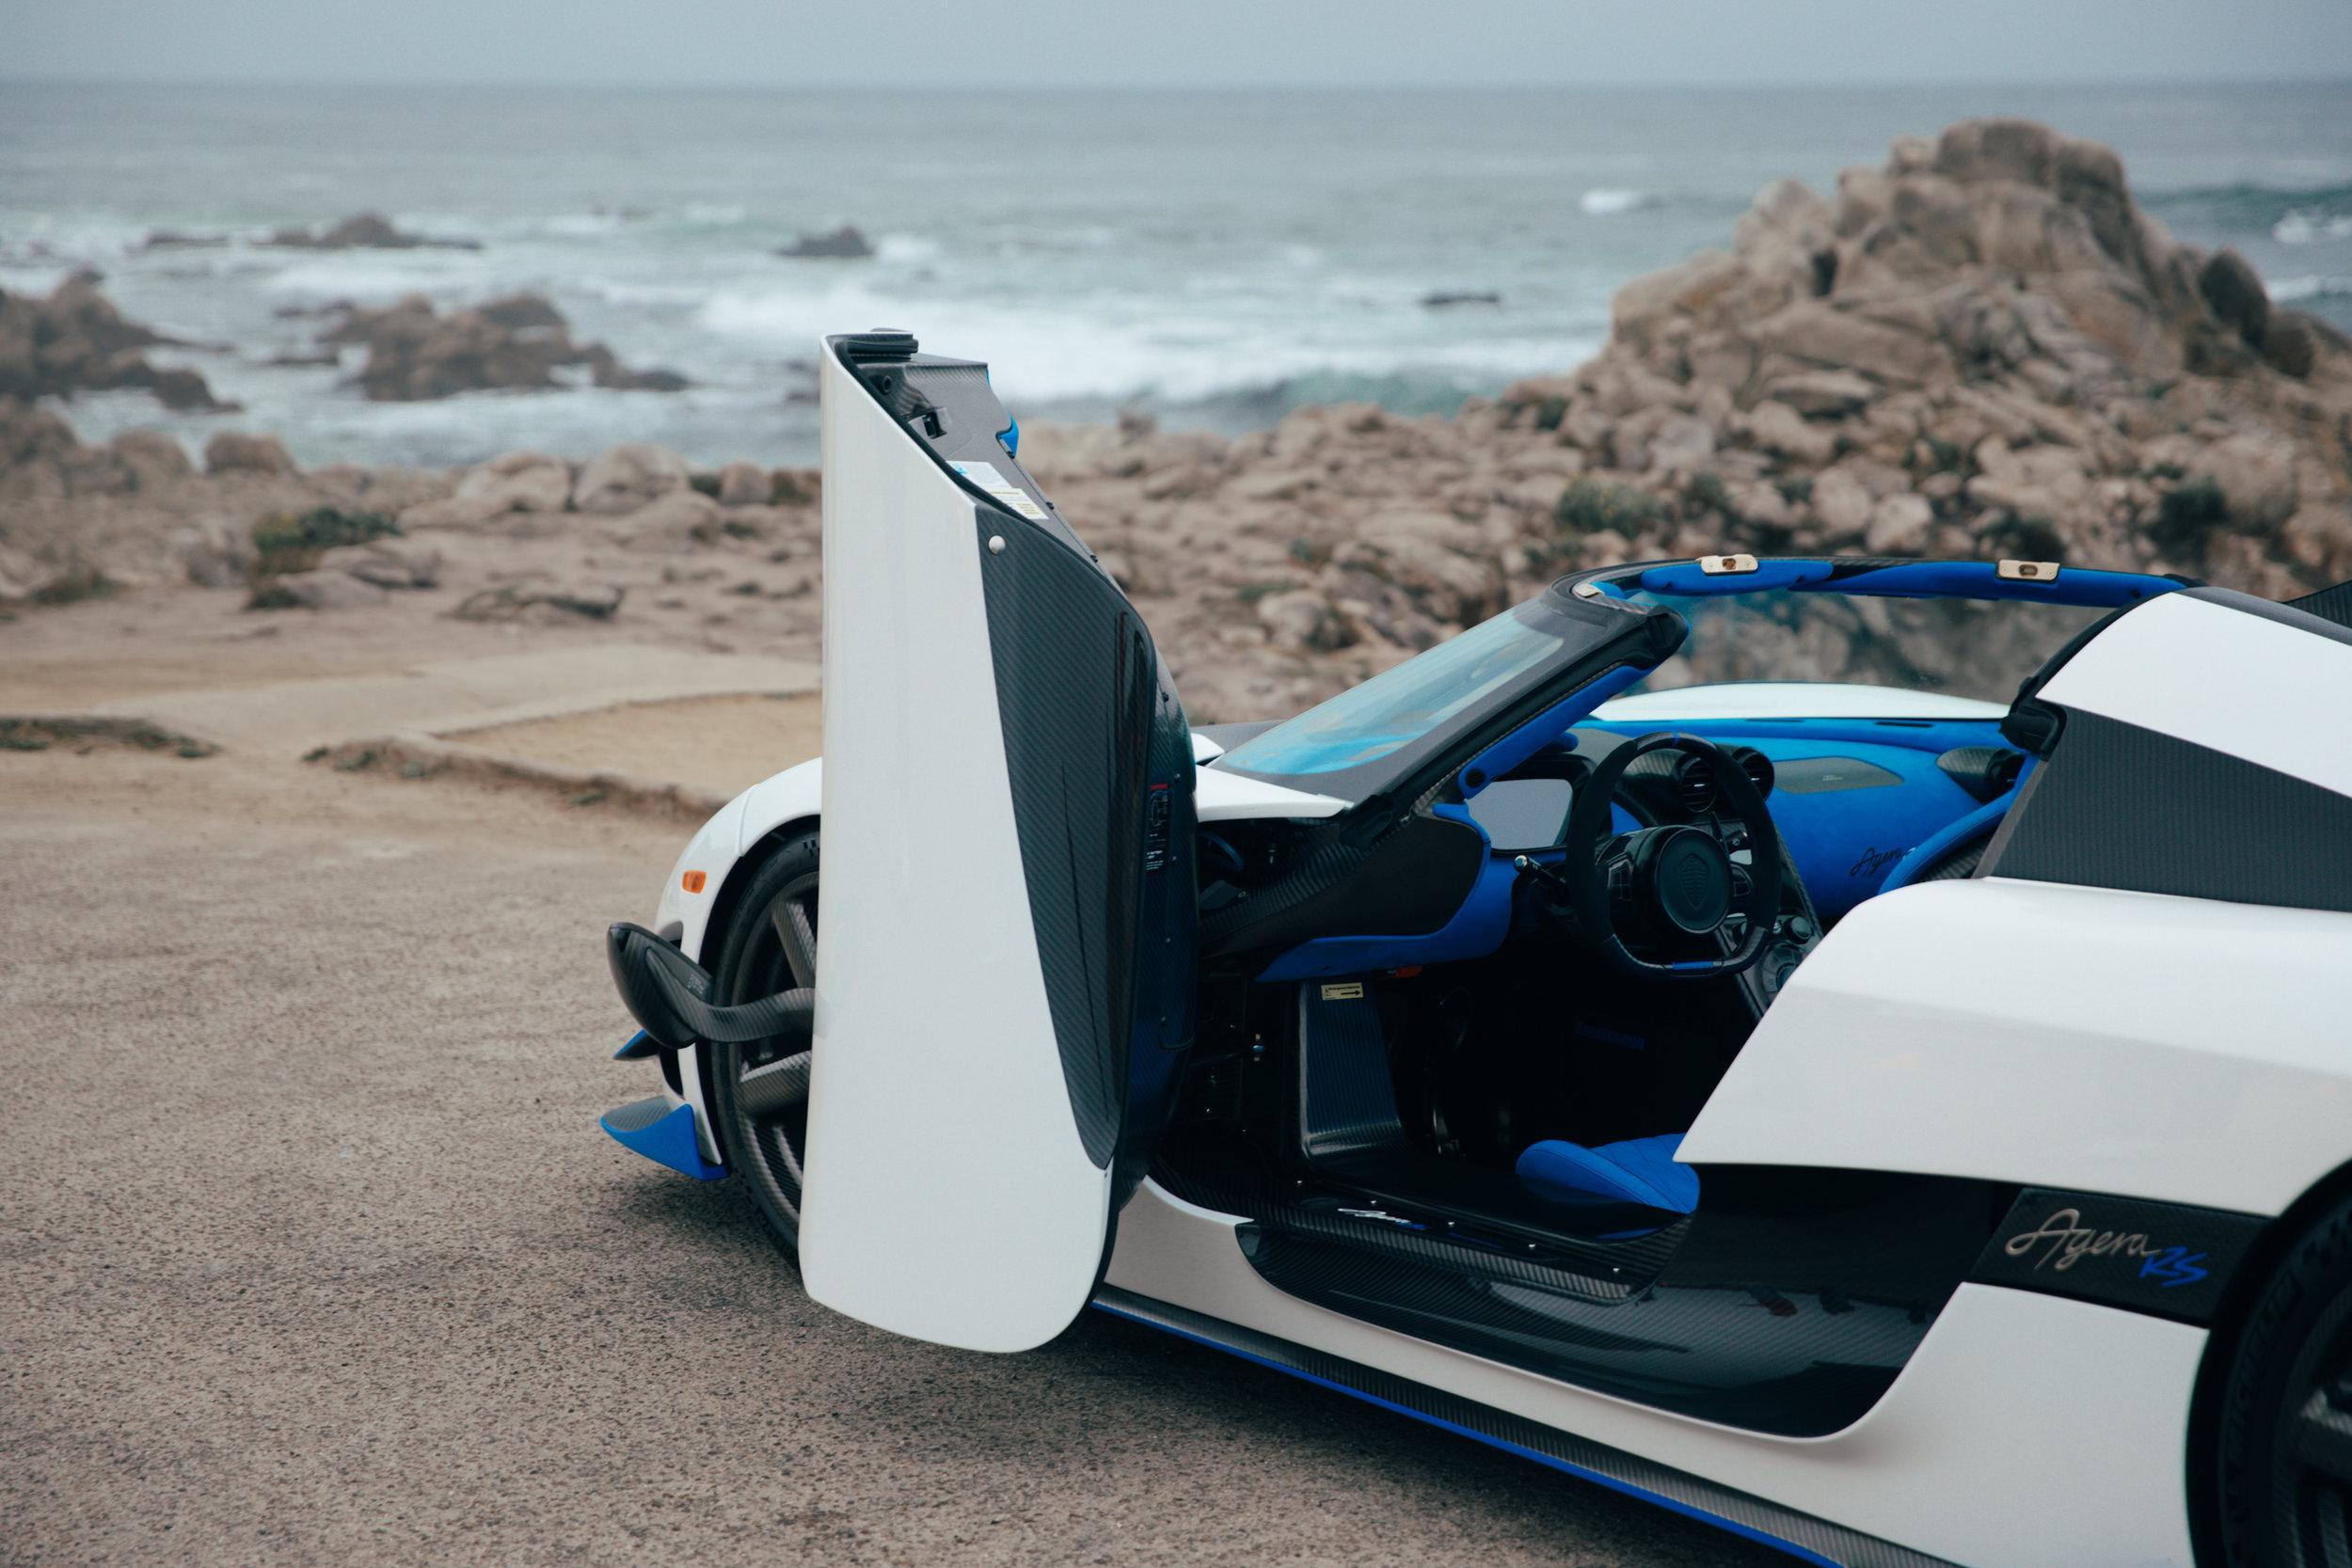 Stay_Driven_Monterey_Car_Week_Whitesse_Koenigsegg-33.jpg